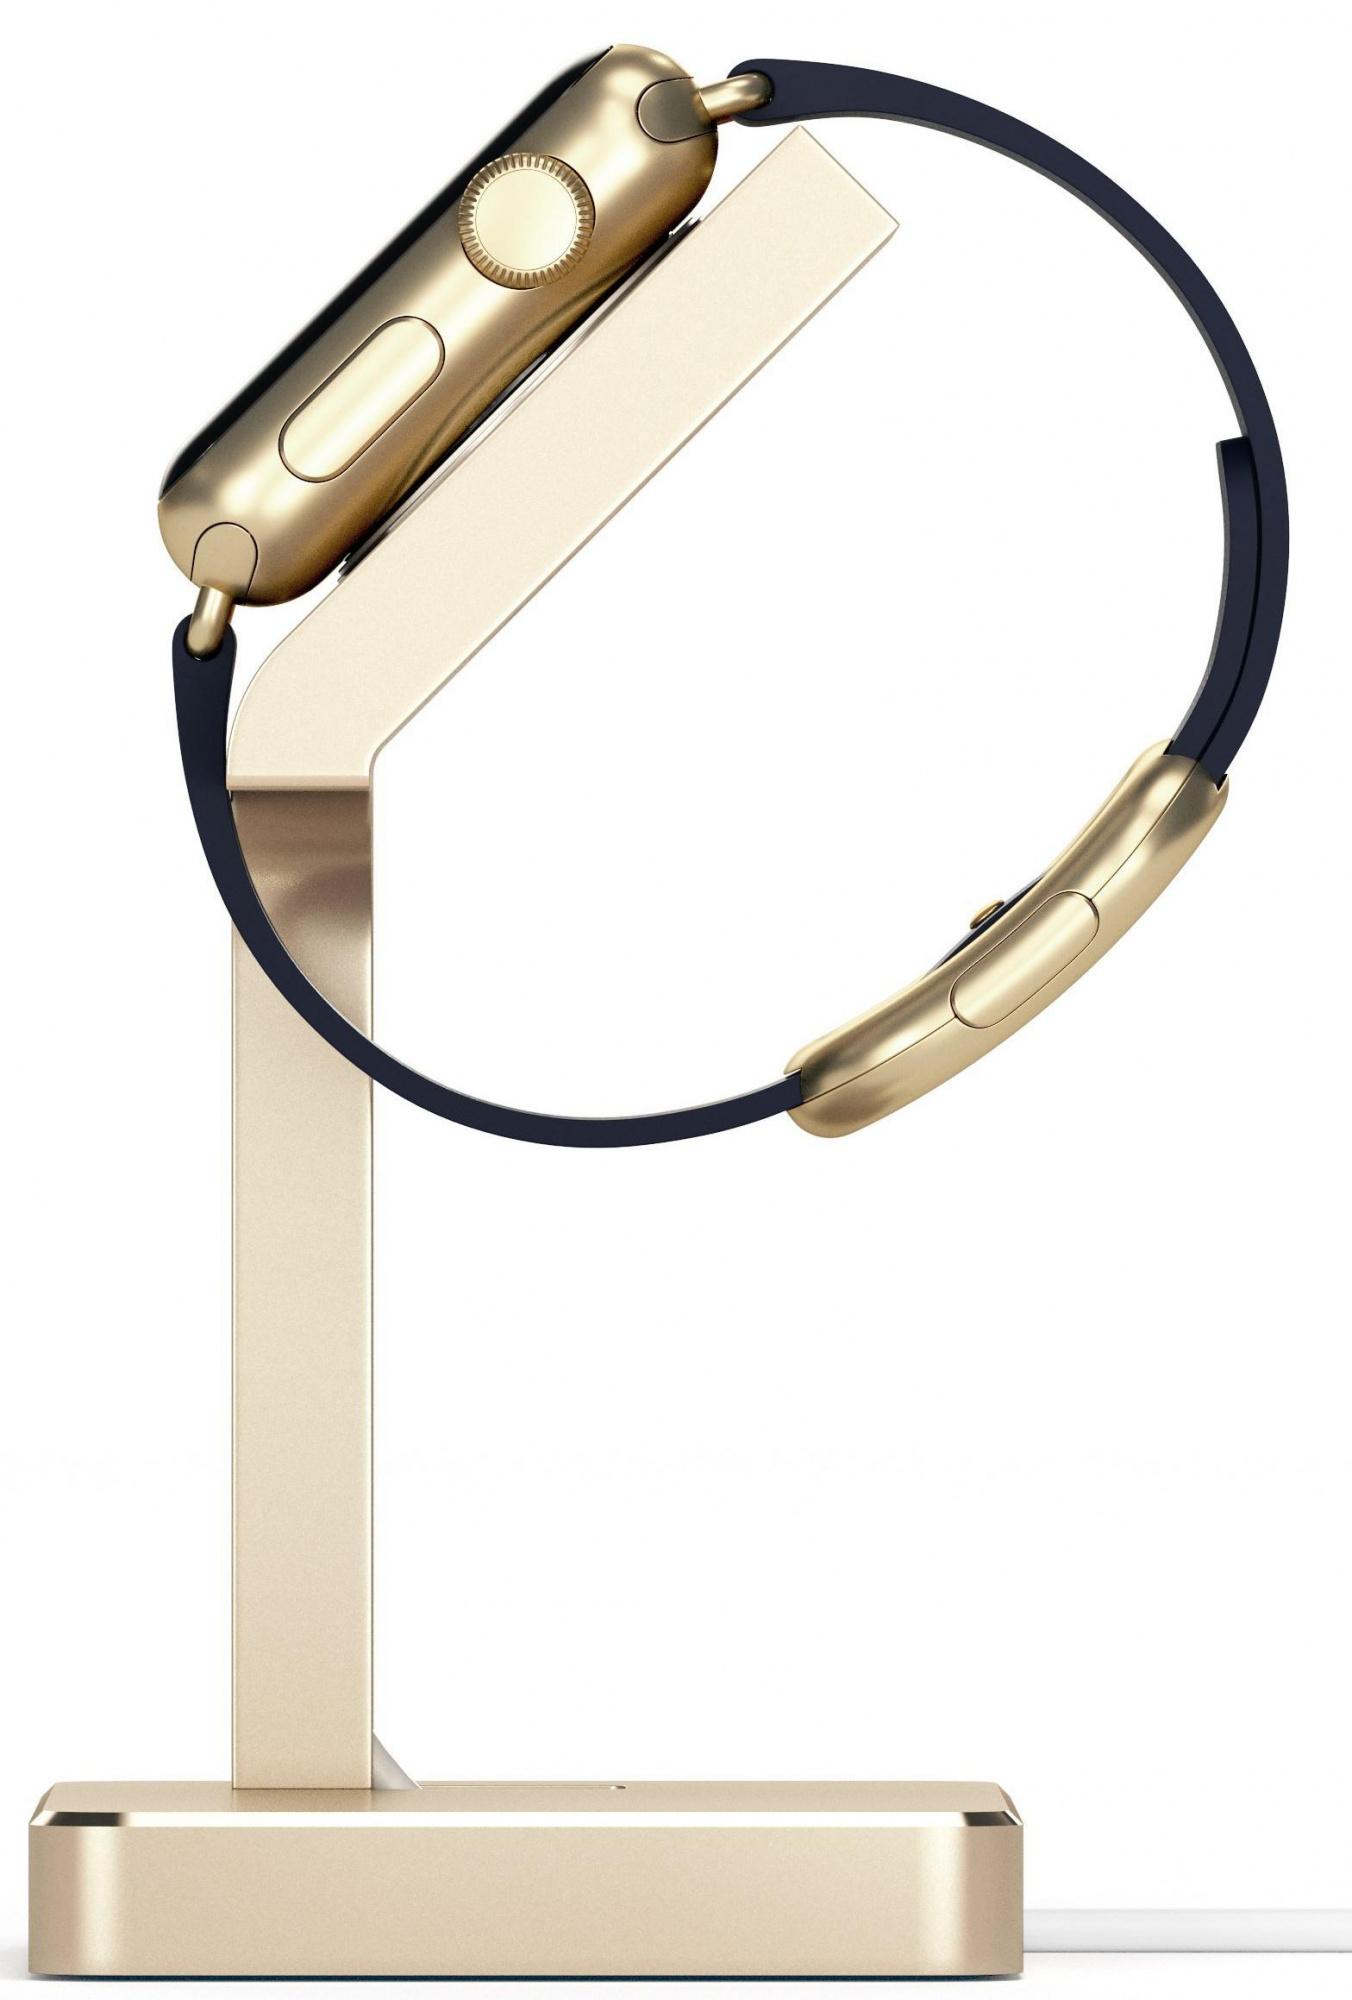 Подставка Satechi Aluminum Apple Watch Charging Stand (ST-AWSG) для Apple Watch/Series 2/3 38/42mm (Gold)